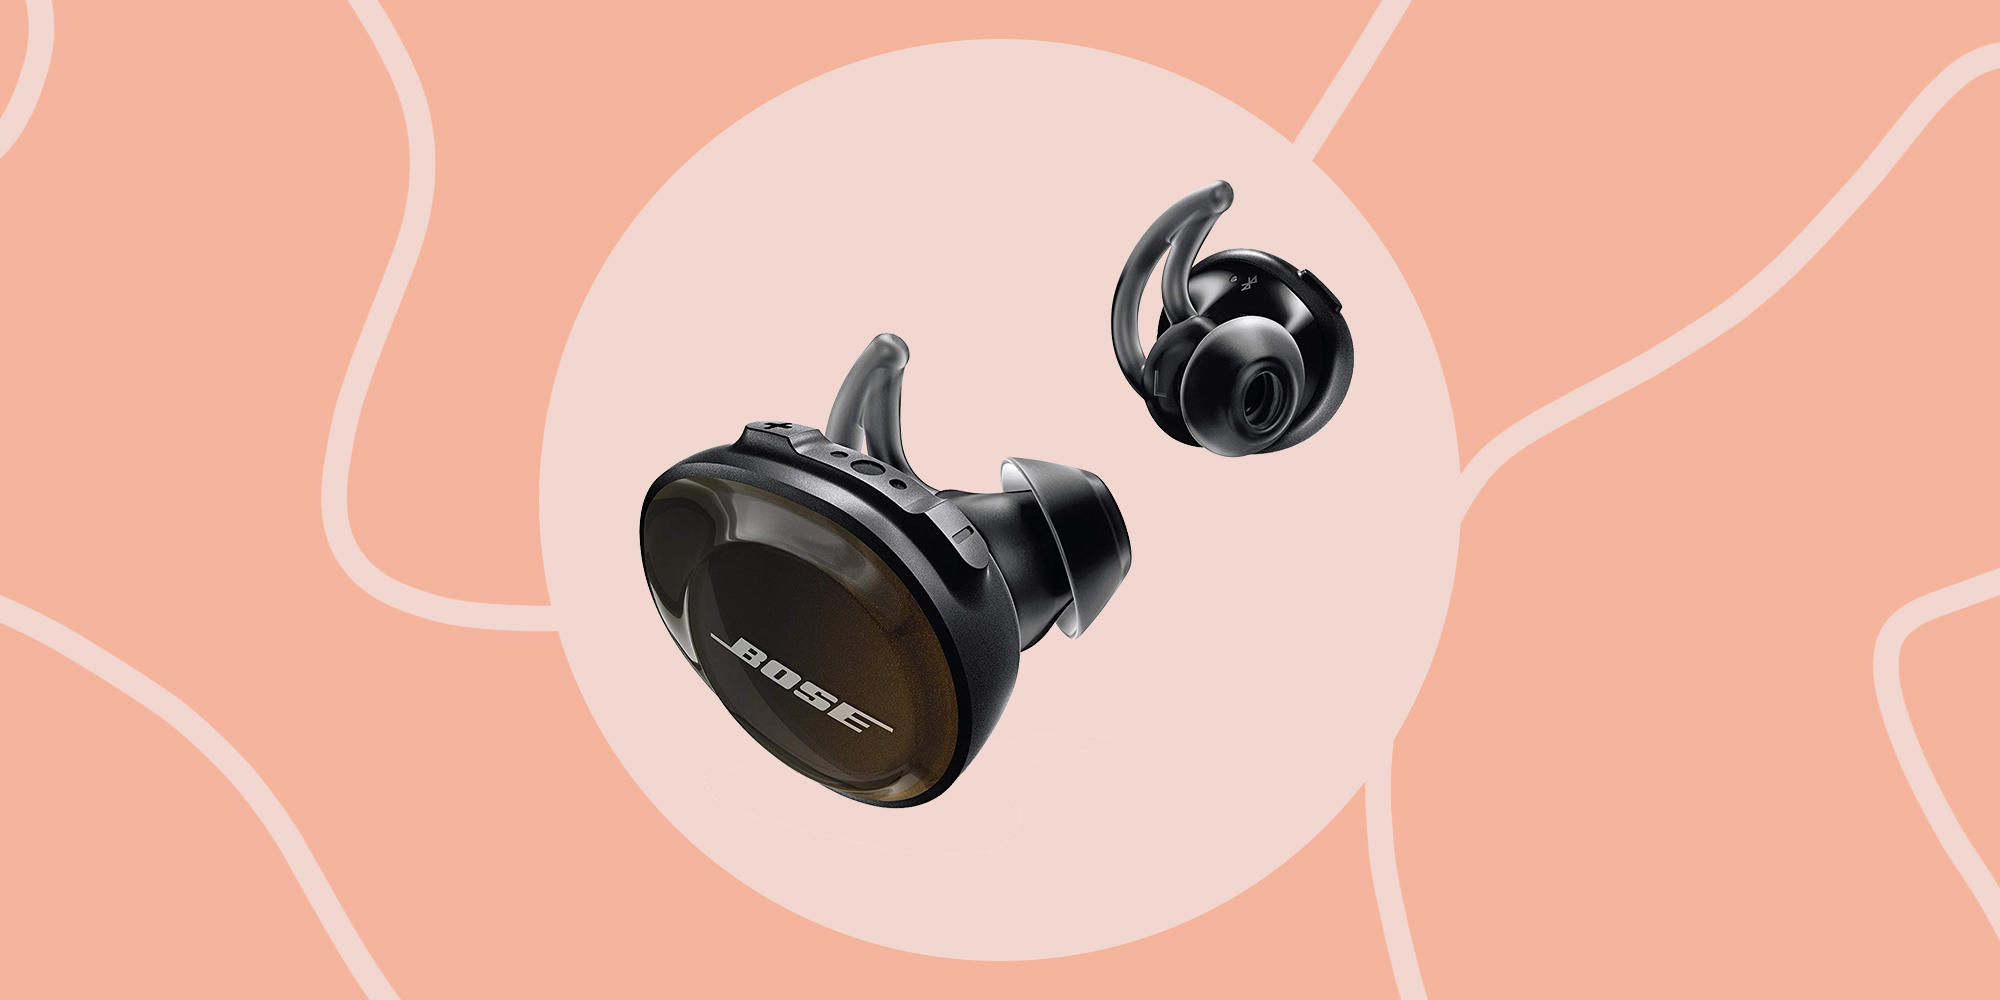 Amazon Is Having an Amazing Sale on These BOSE Wireless Headphones